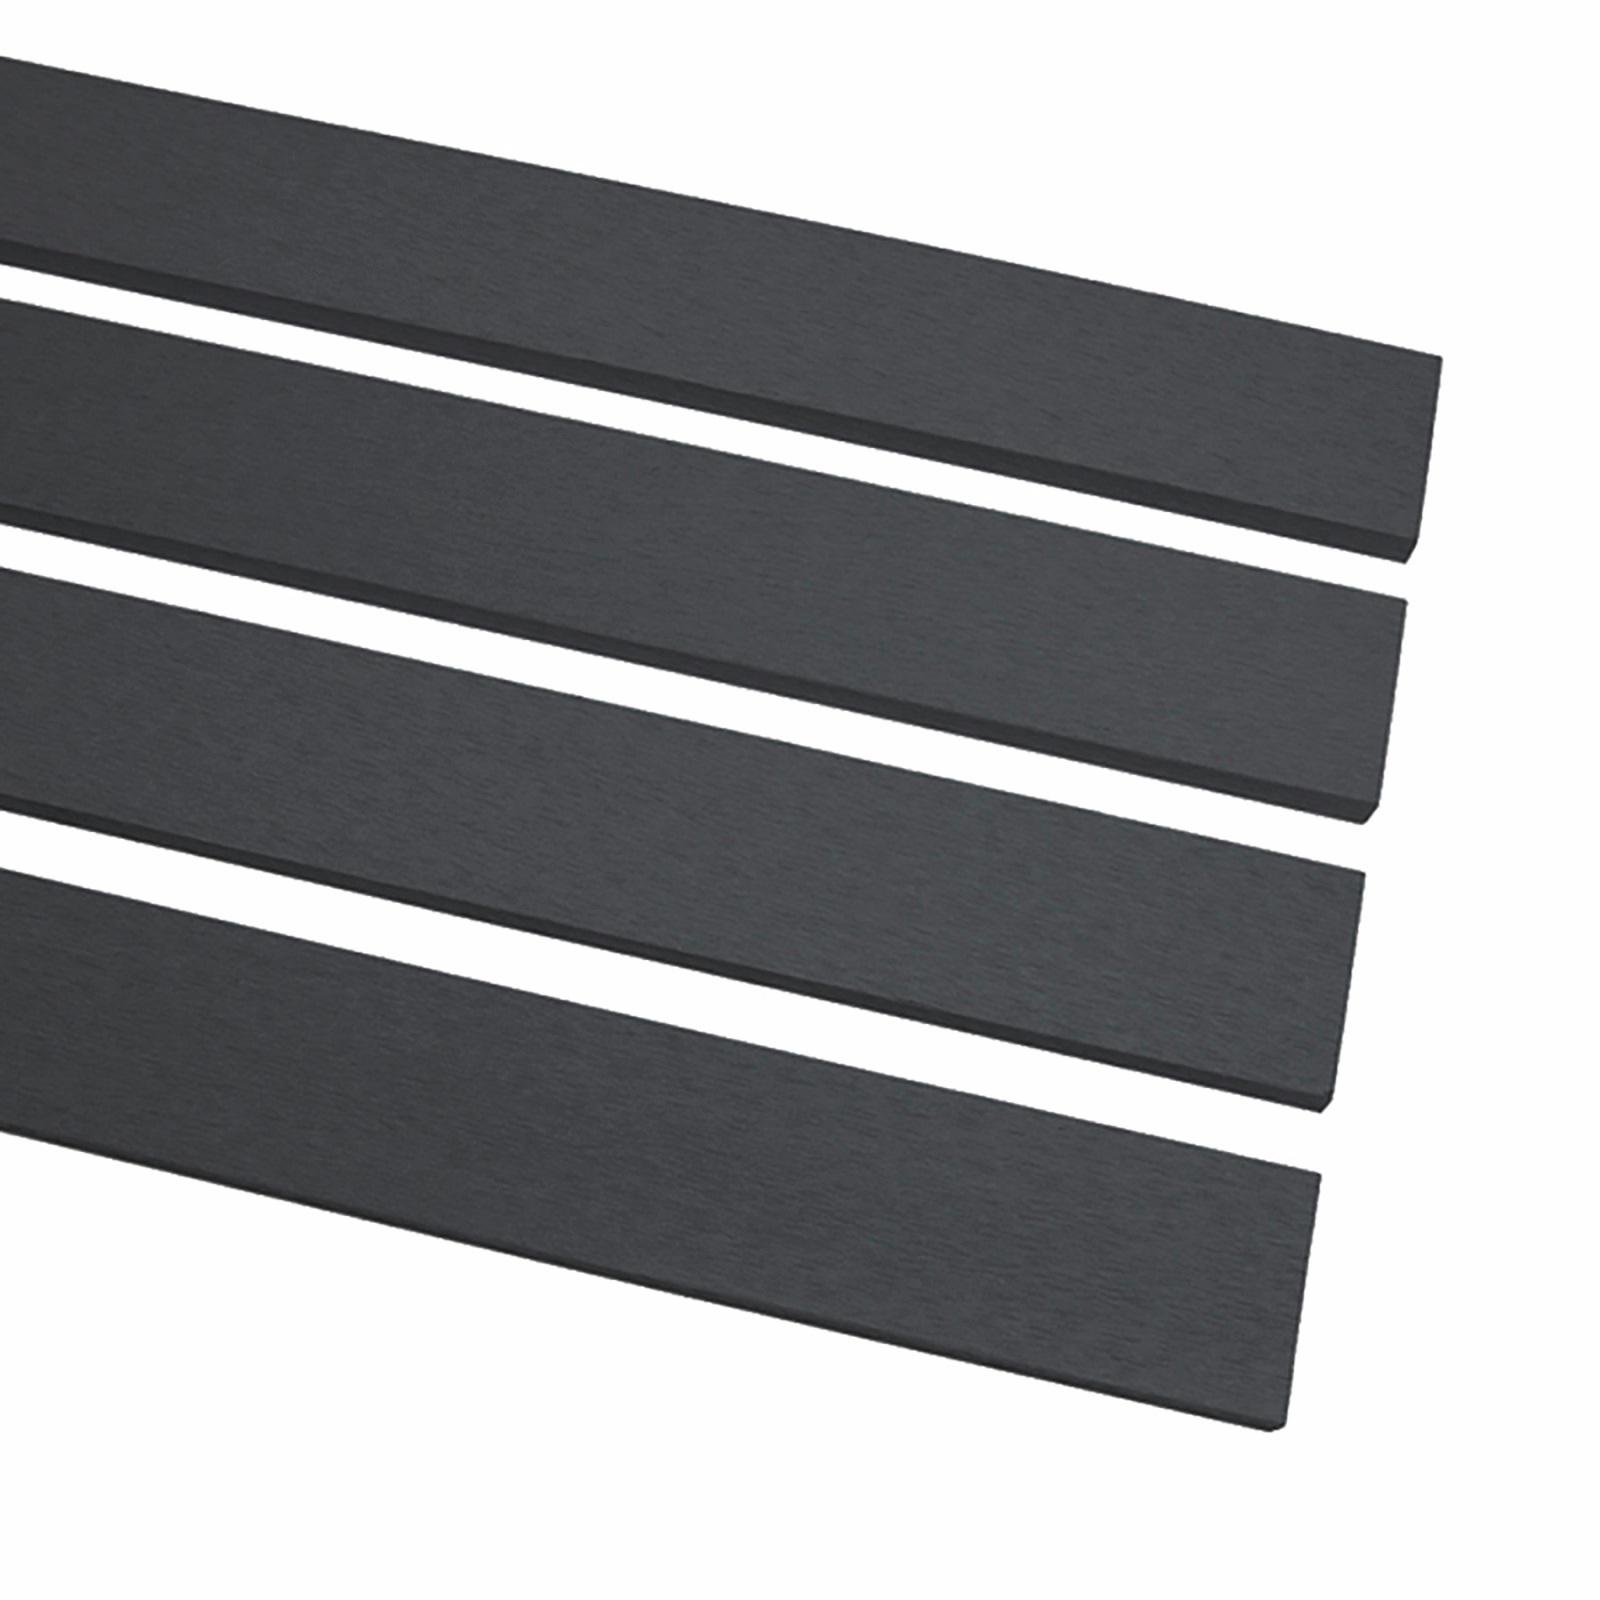 Ekodeck 67 x 15mm 2.7m Greystone Composite Screening